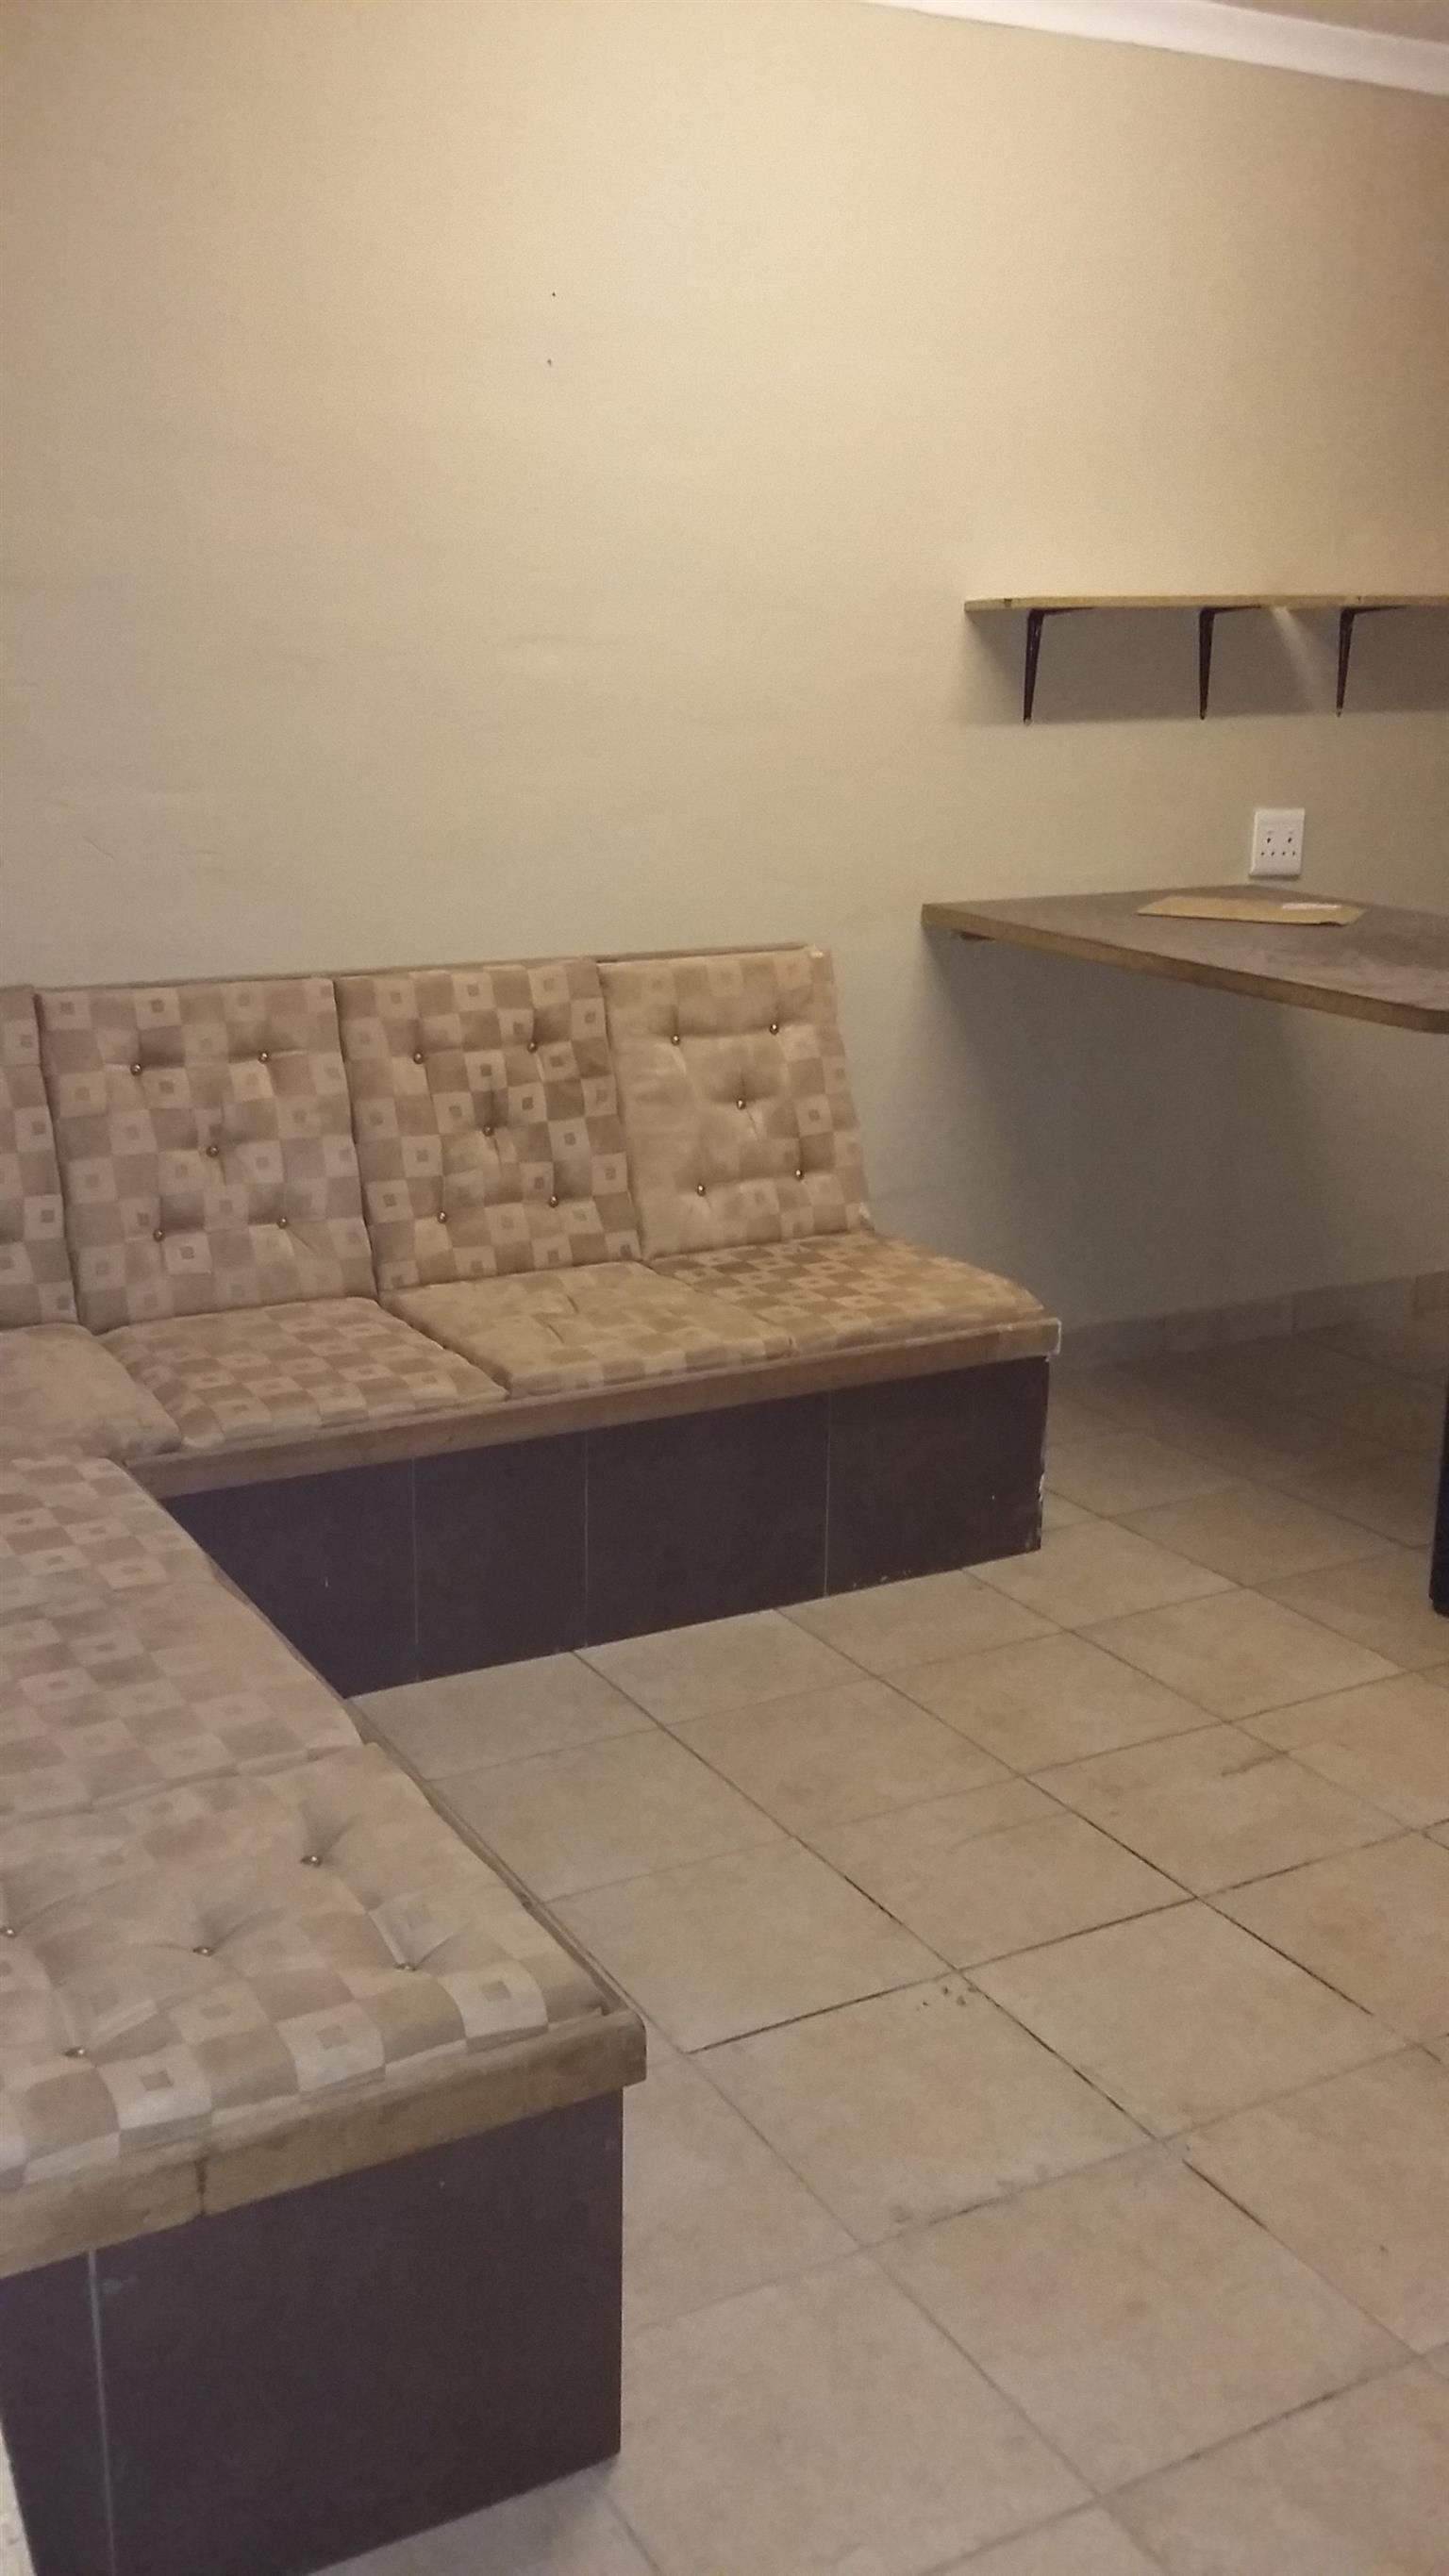 1 Bedroom flat - Donkerhoek Pretoria East   Junk Mail